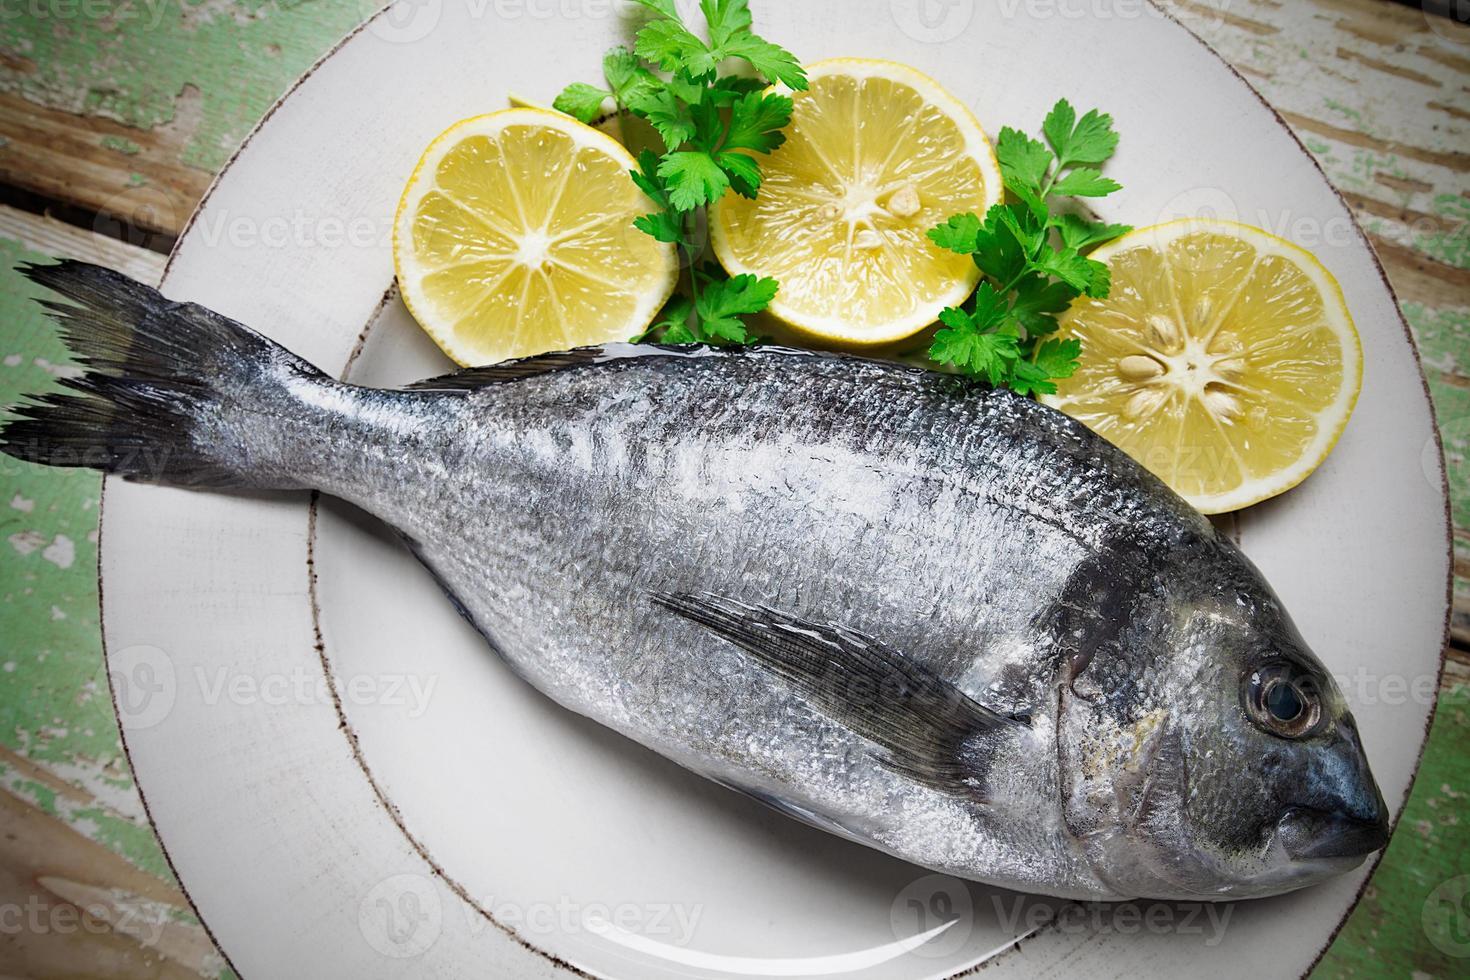 Fish and Lemon photo